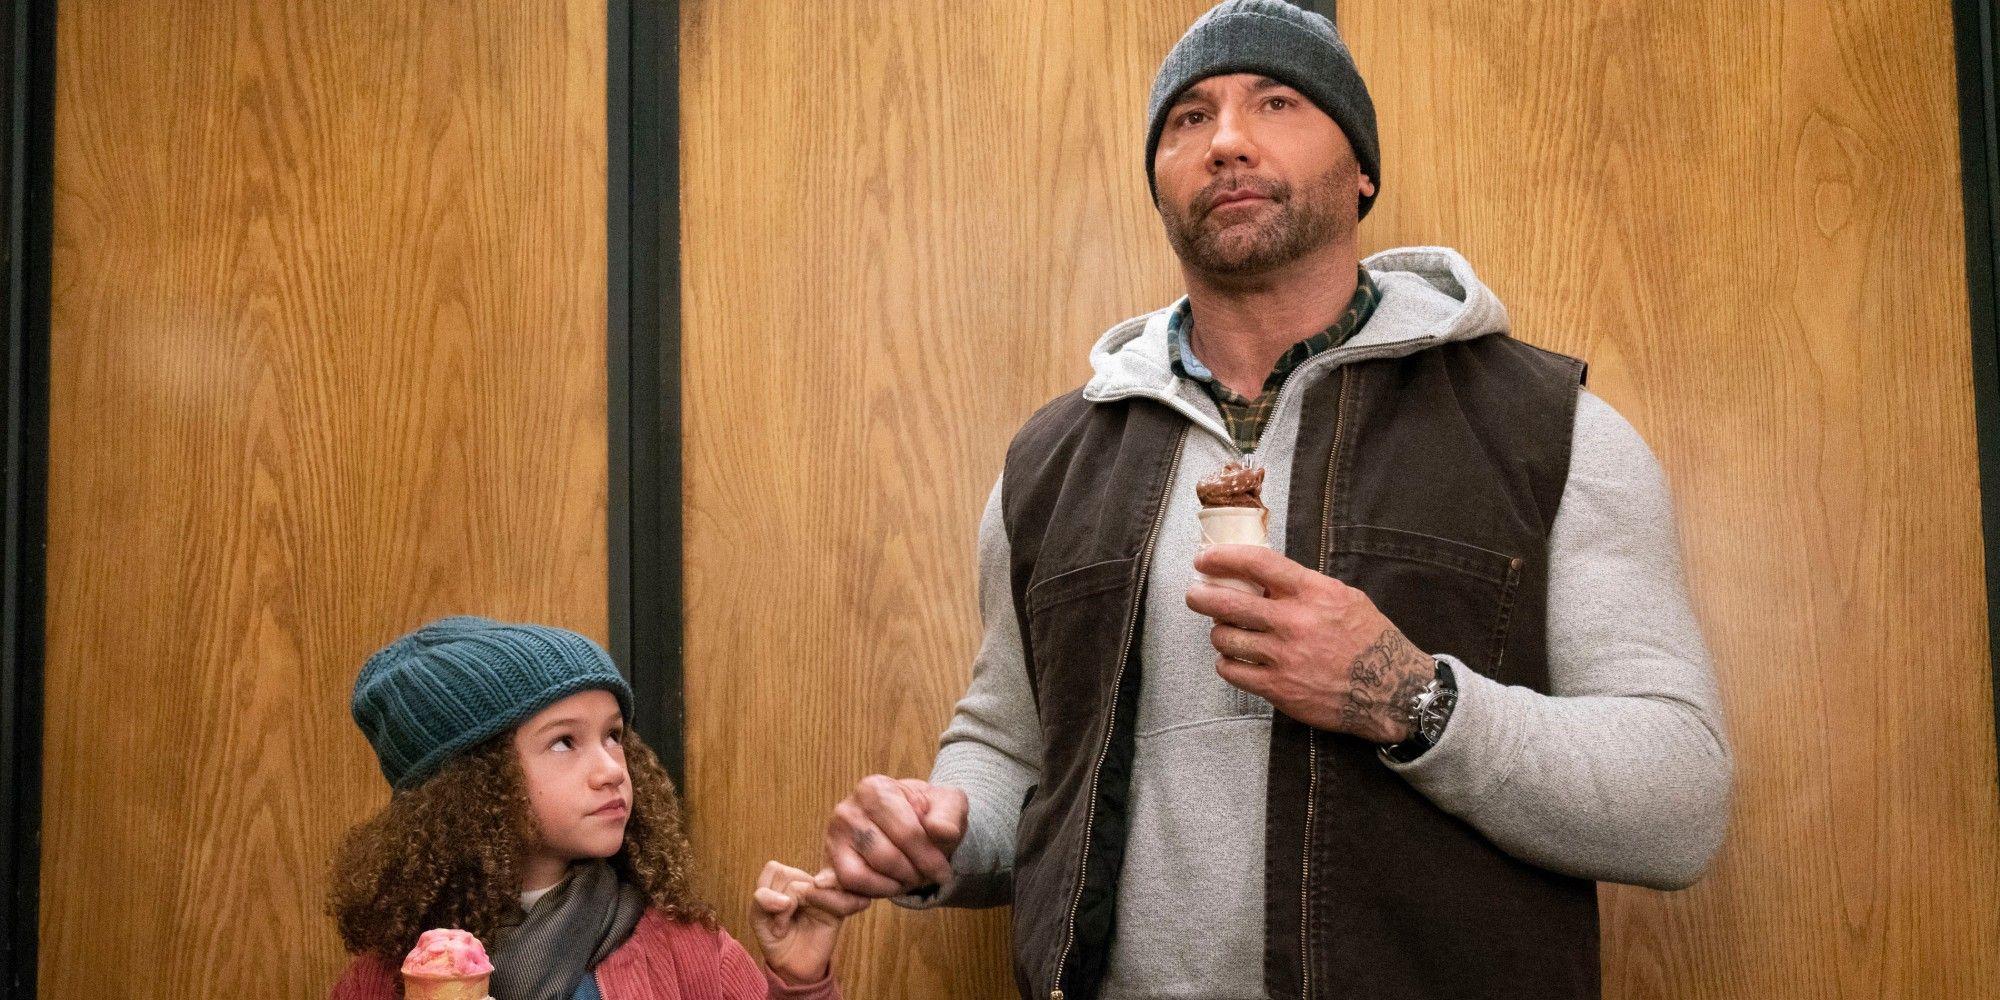 My Spy Trailer: Dave Bautista Gets His Own Kindergarten Cop